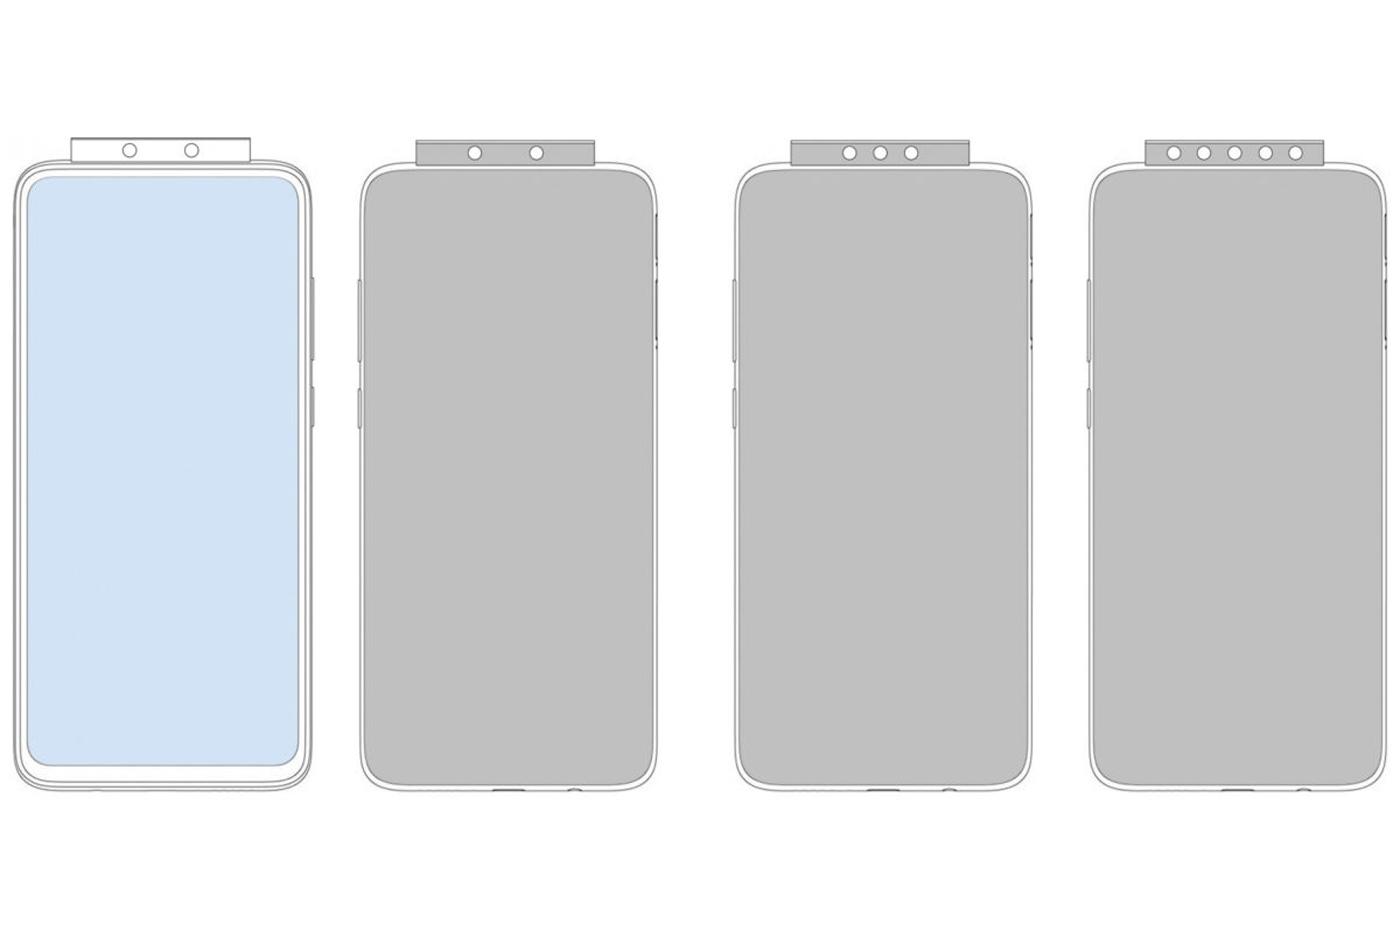 Brevet Xiaomi Smartphone pop-up à sept capteurs photo